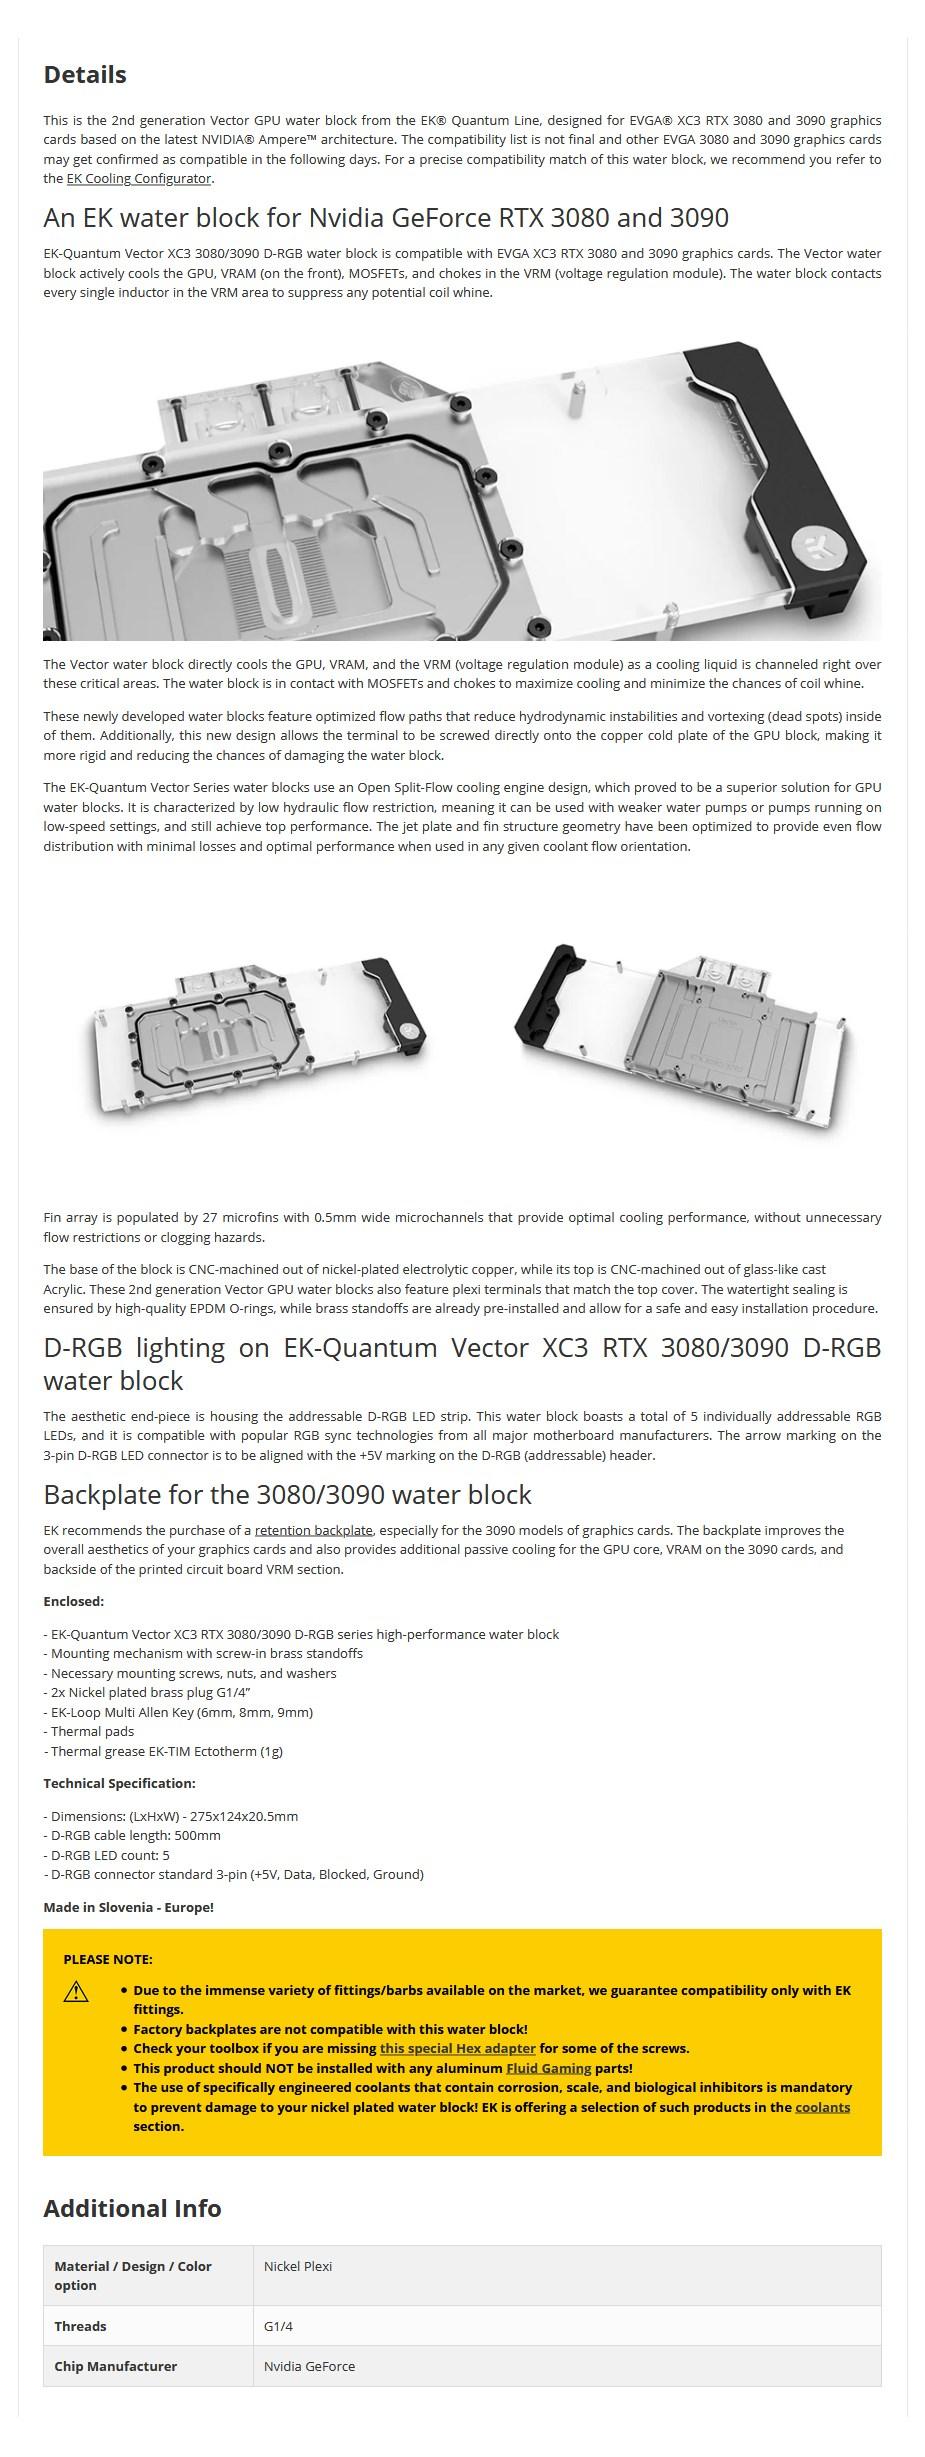 EKWB EK-Quantum Vector D-RGB XC3 RTX 3080/3090 GPU Water Block - Nickel + Plexi - Overview 1